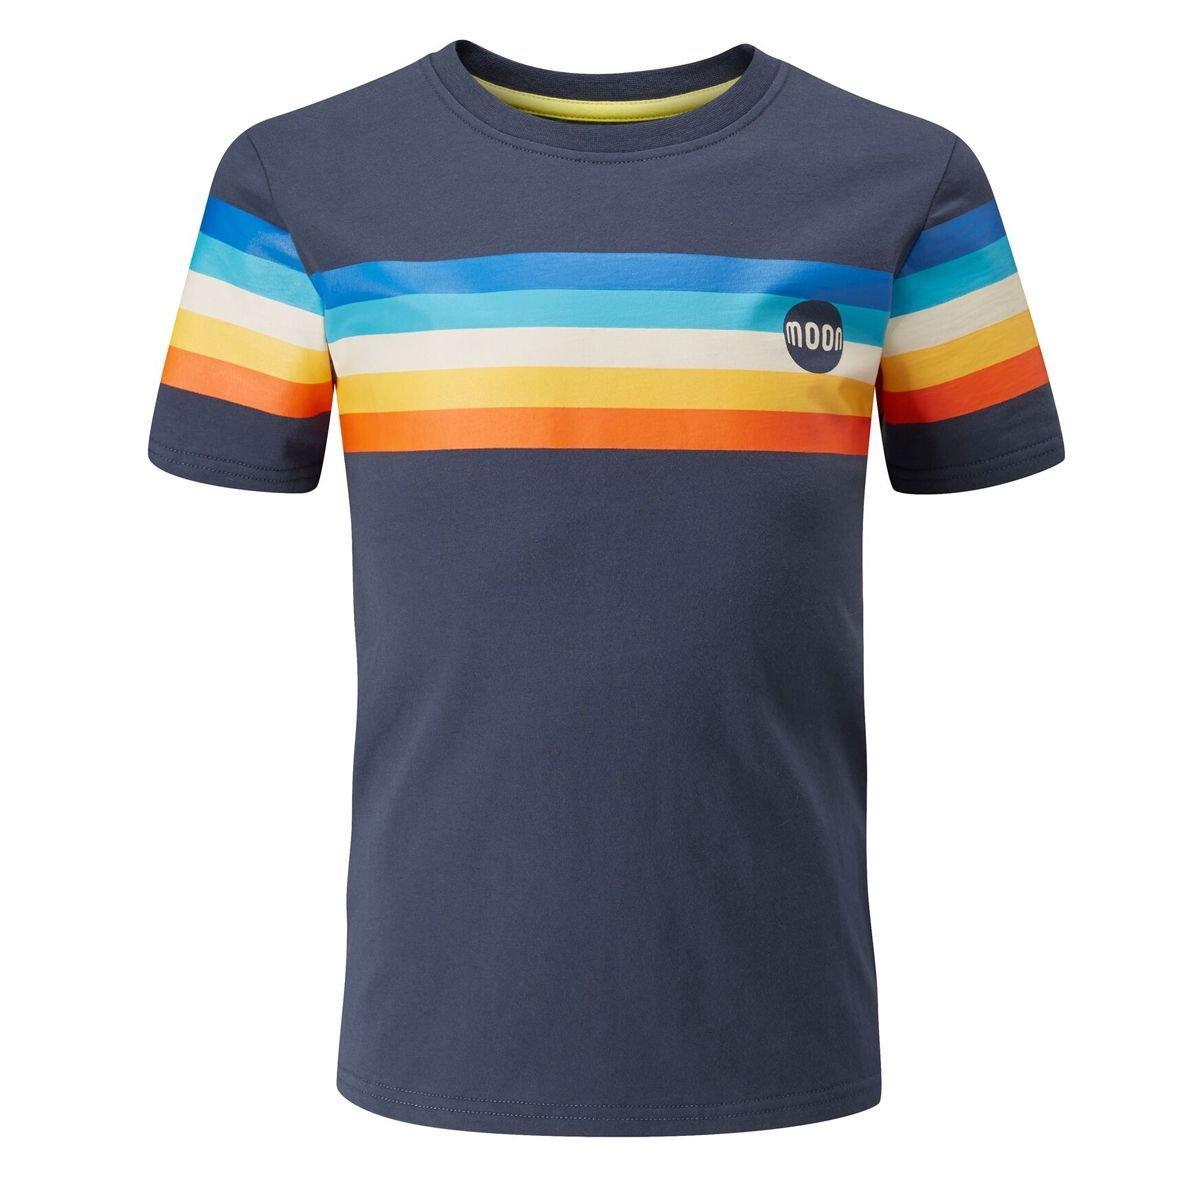 Moon Kids' Half Moon Retro Stripe T-Shirt